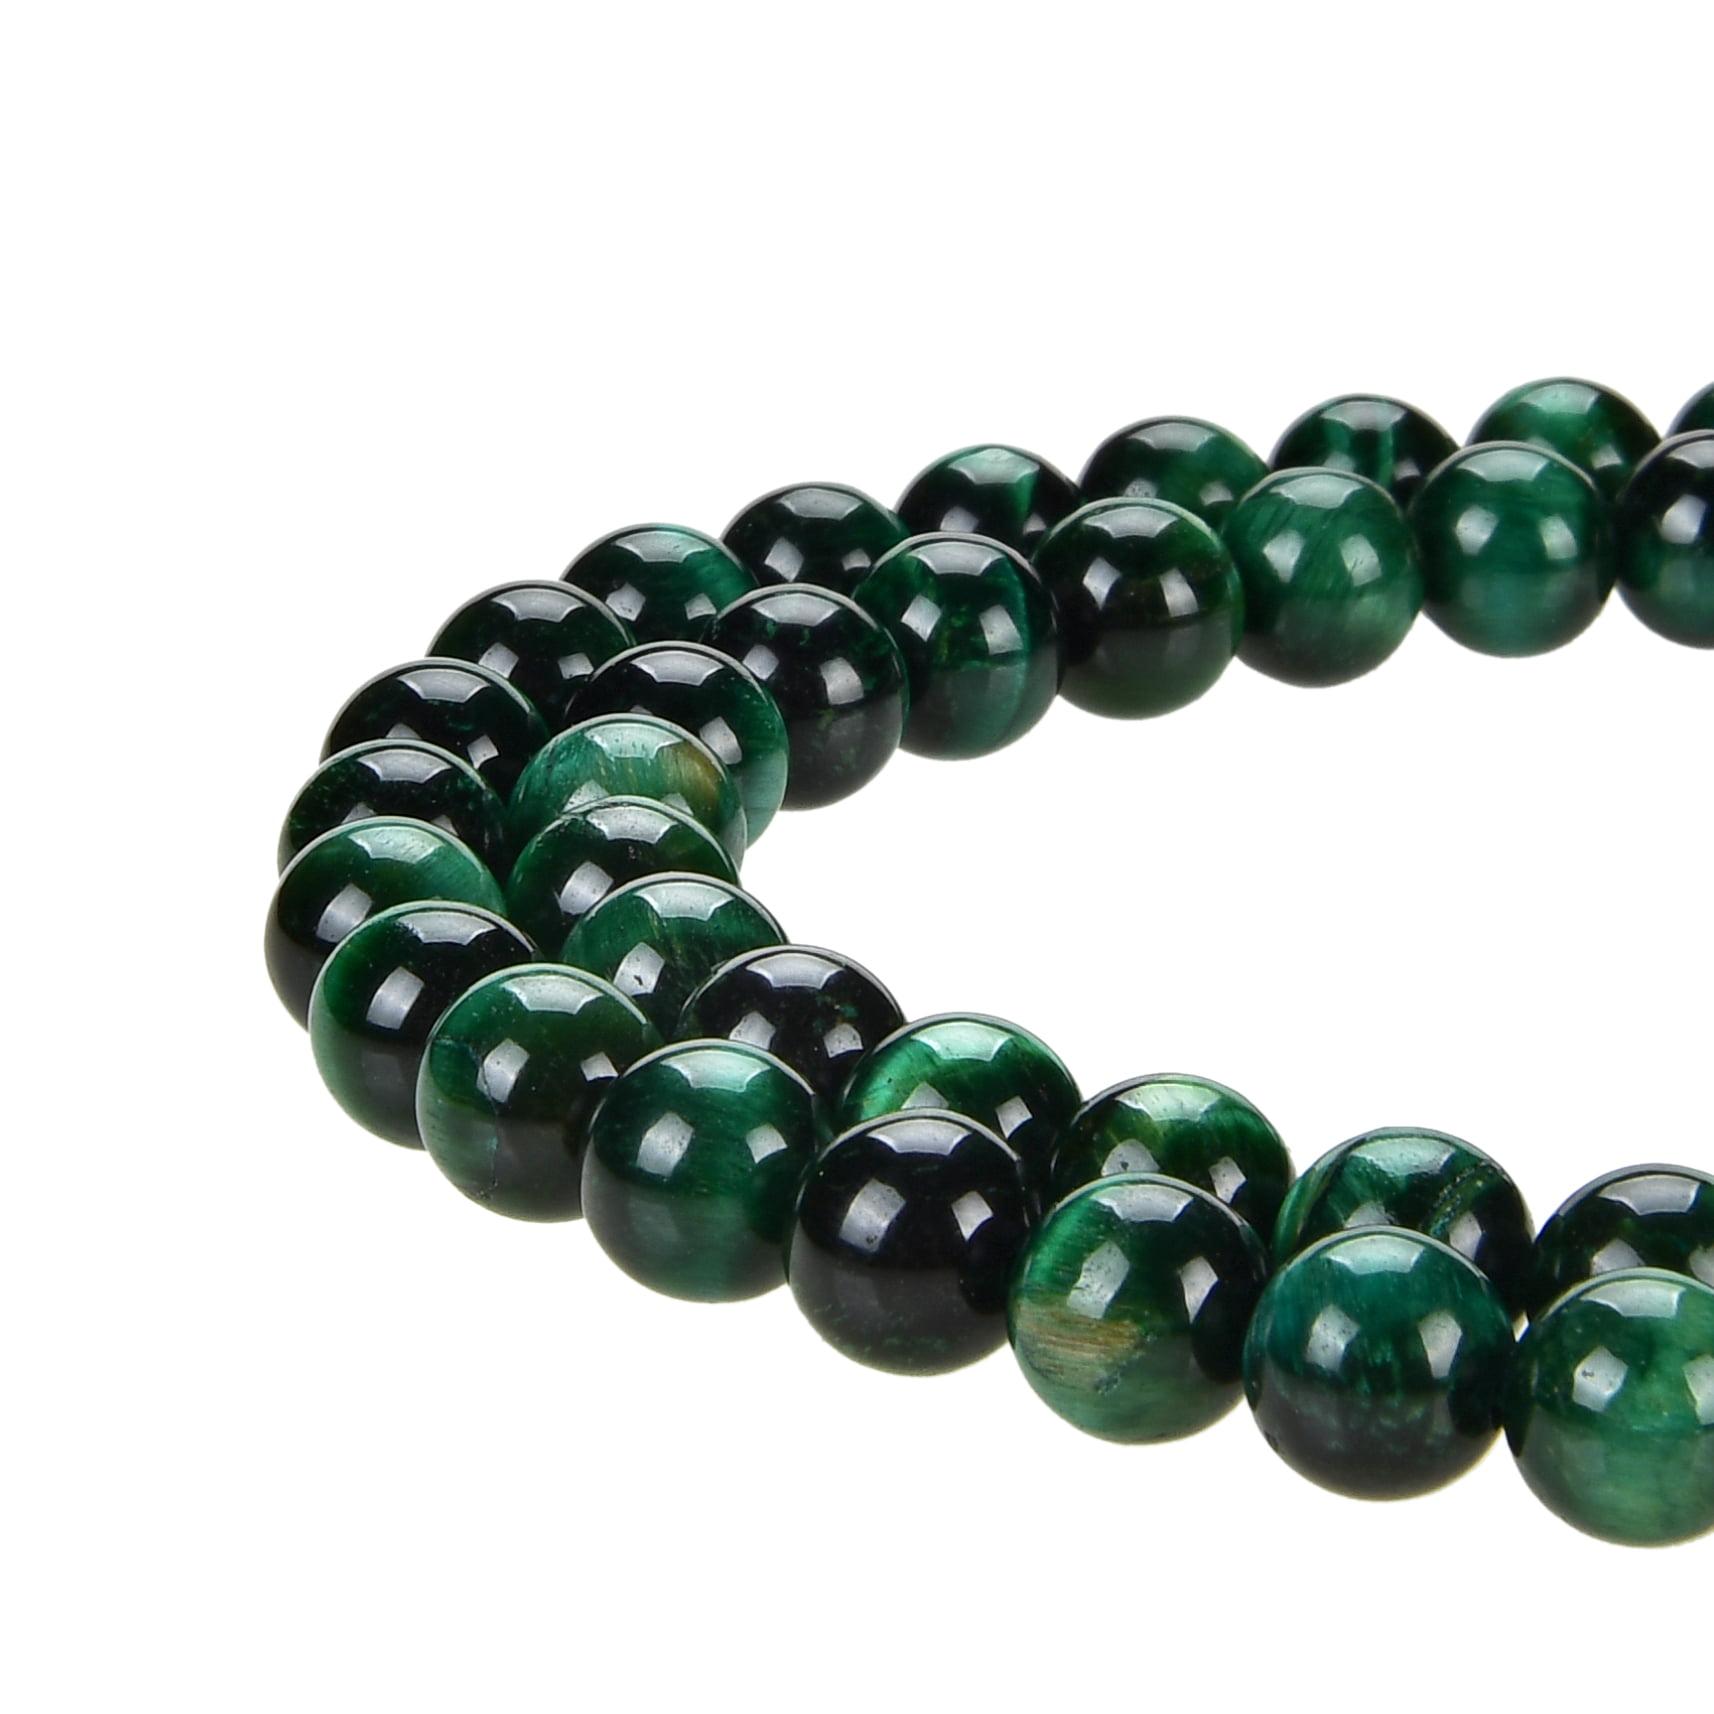 Natural Tiger Eye Stone Beads Bracelet DIY Jewelry Making Bracelet Necklace Beads Grade AAA 4681012mm Round Stone Beads Natural Beads